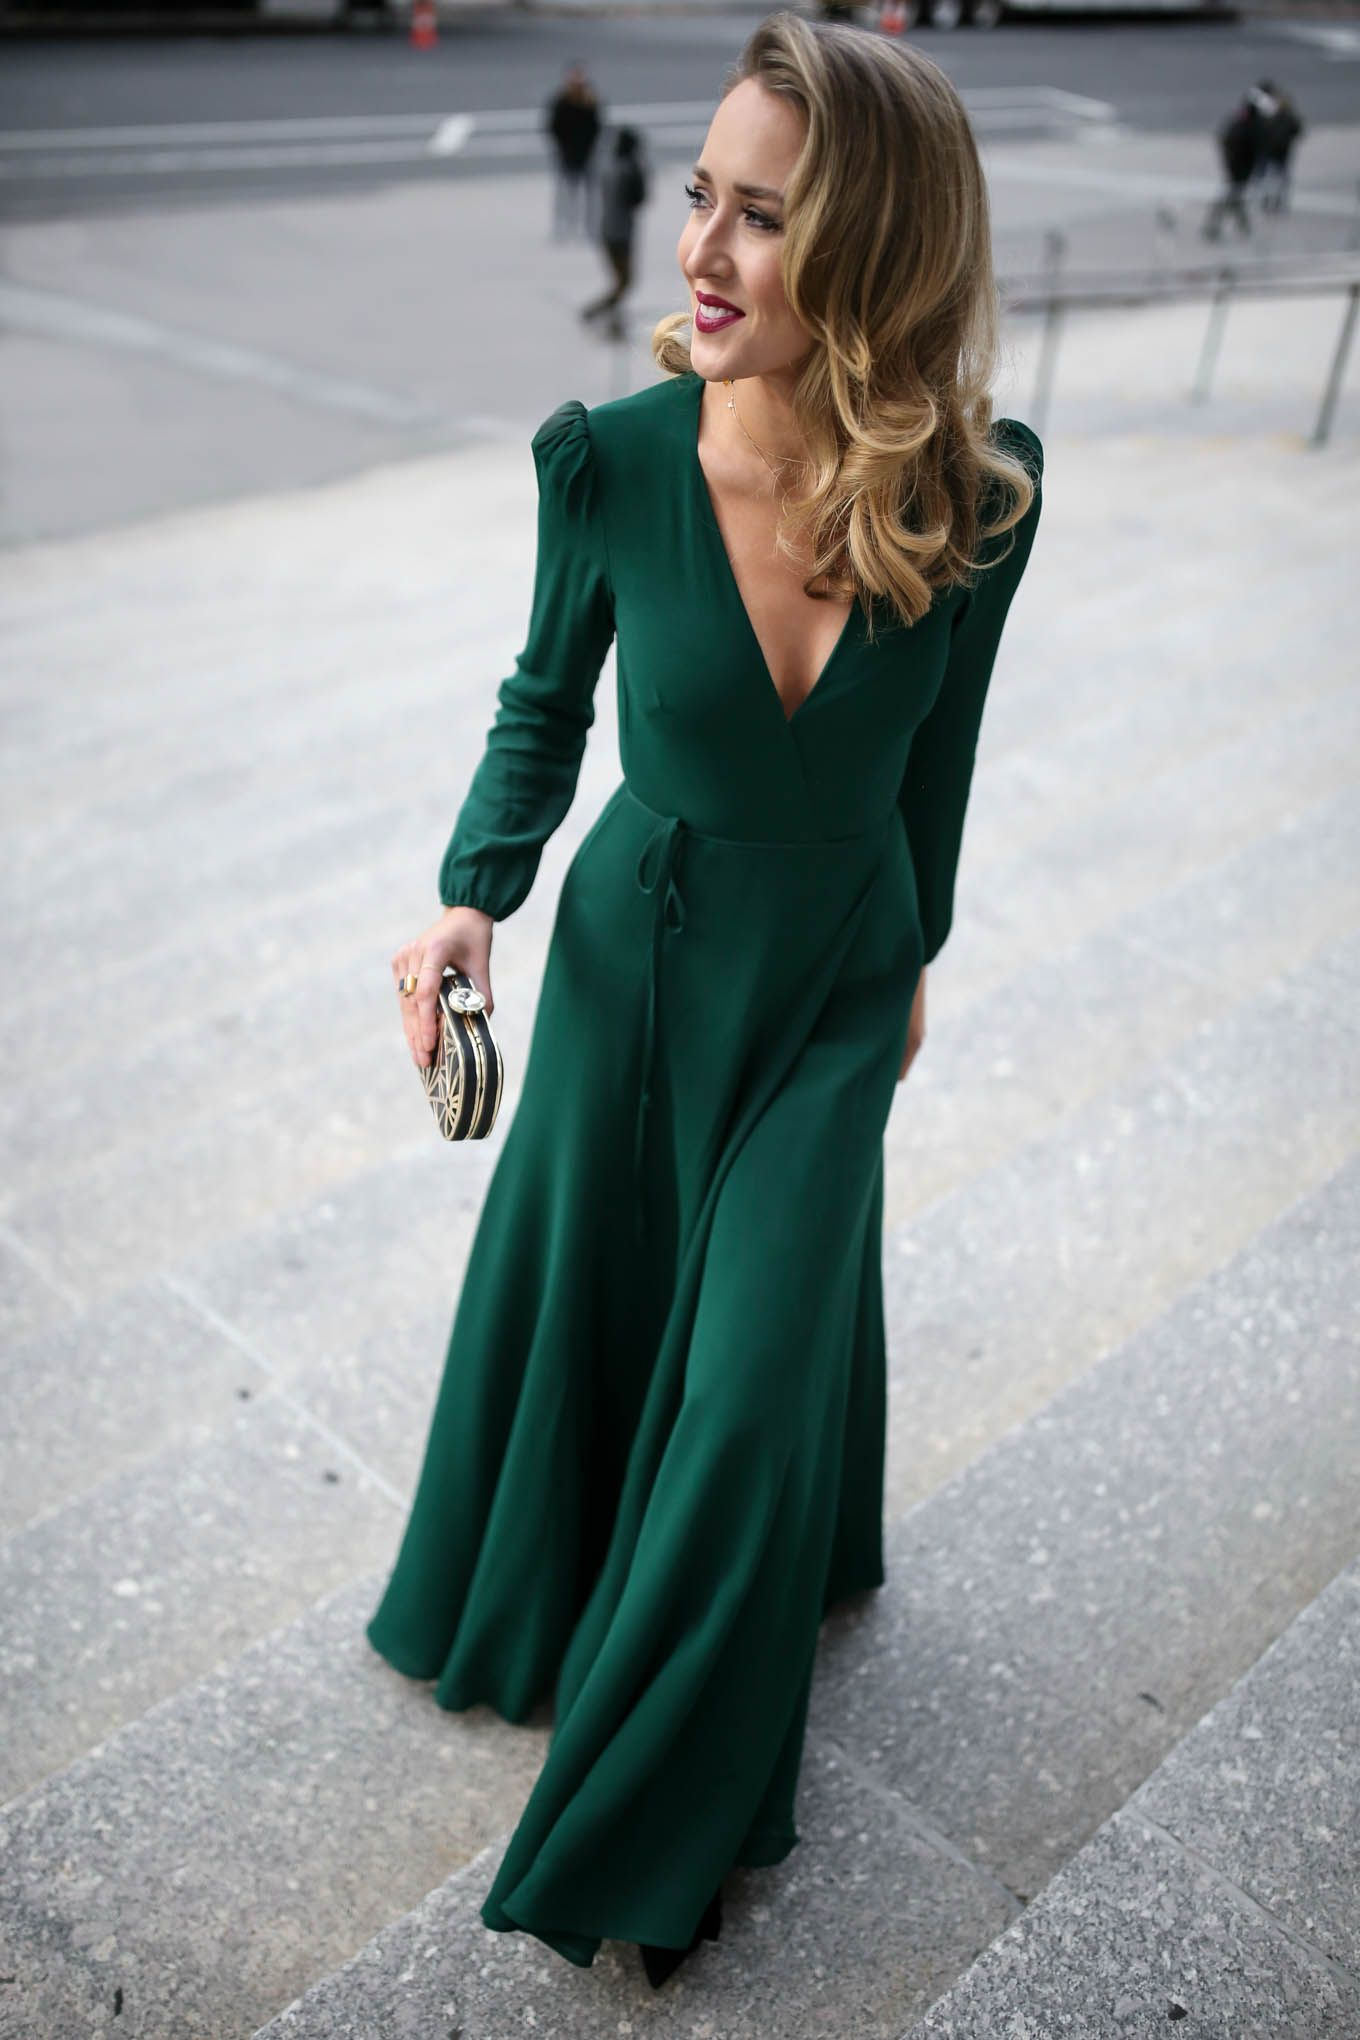 Pin By Anastasia Kadlub On Ladies 4 Fashion Formal Wedding Guests Guest Dresses [ jpg ]